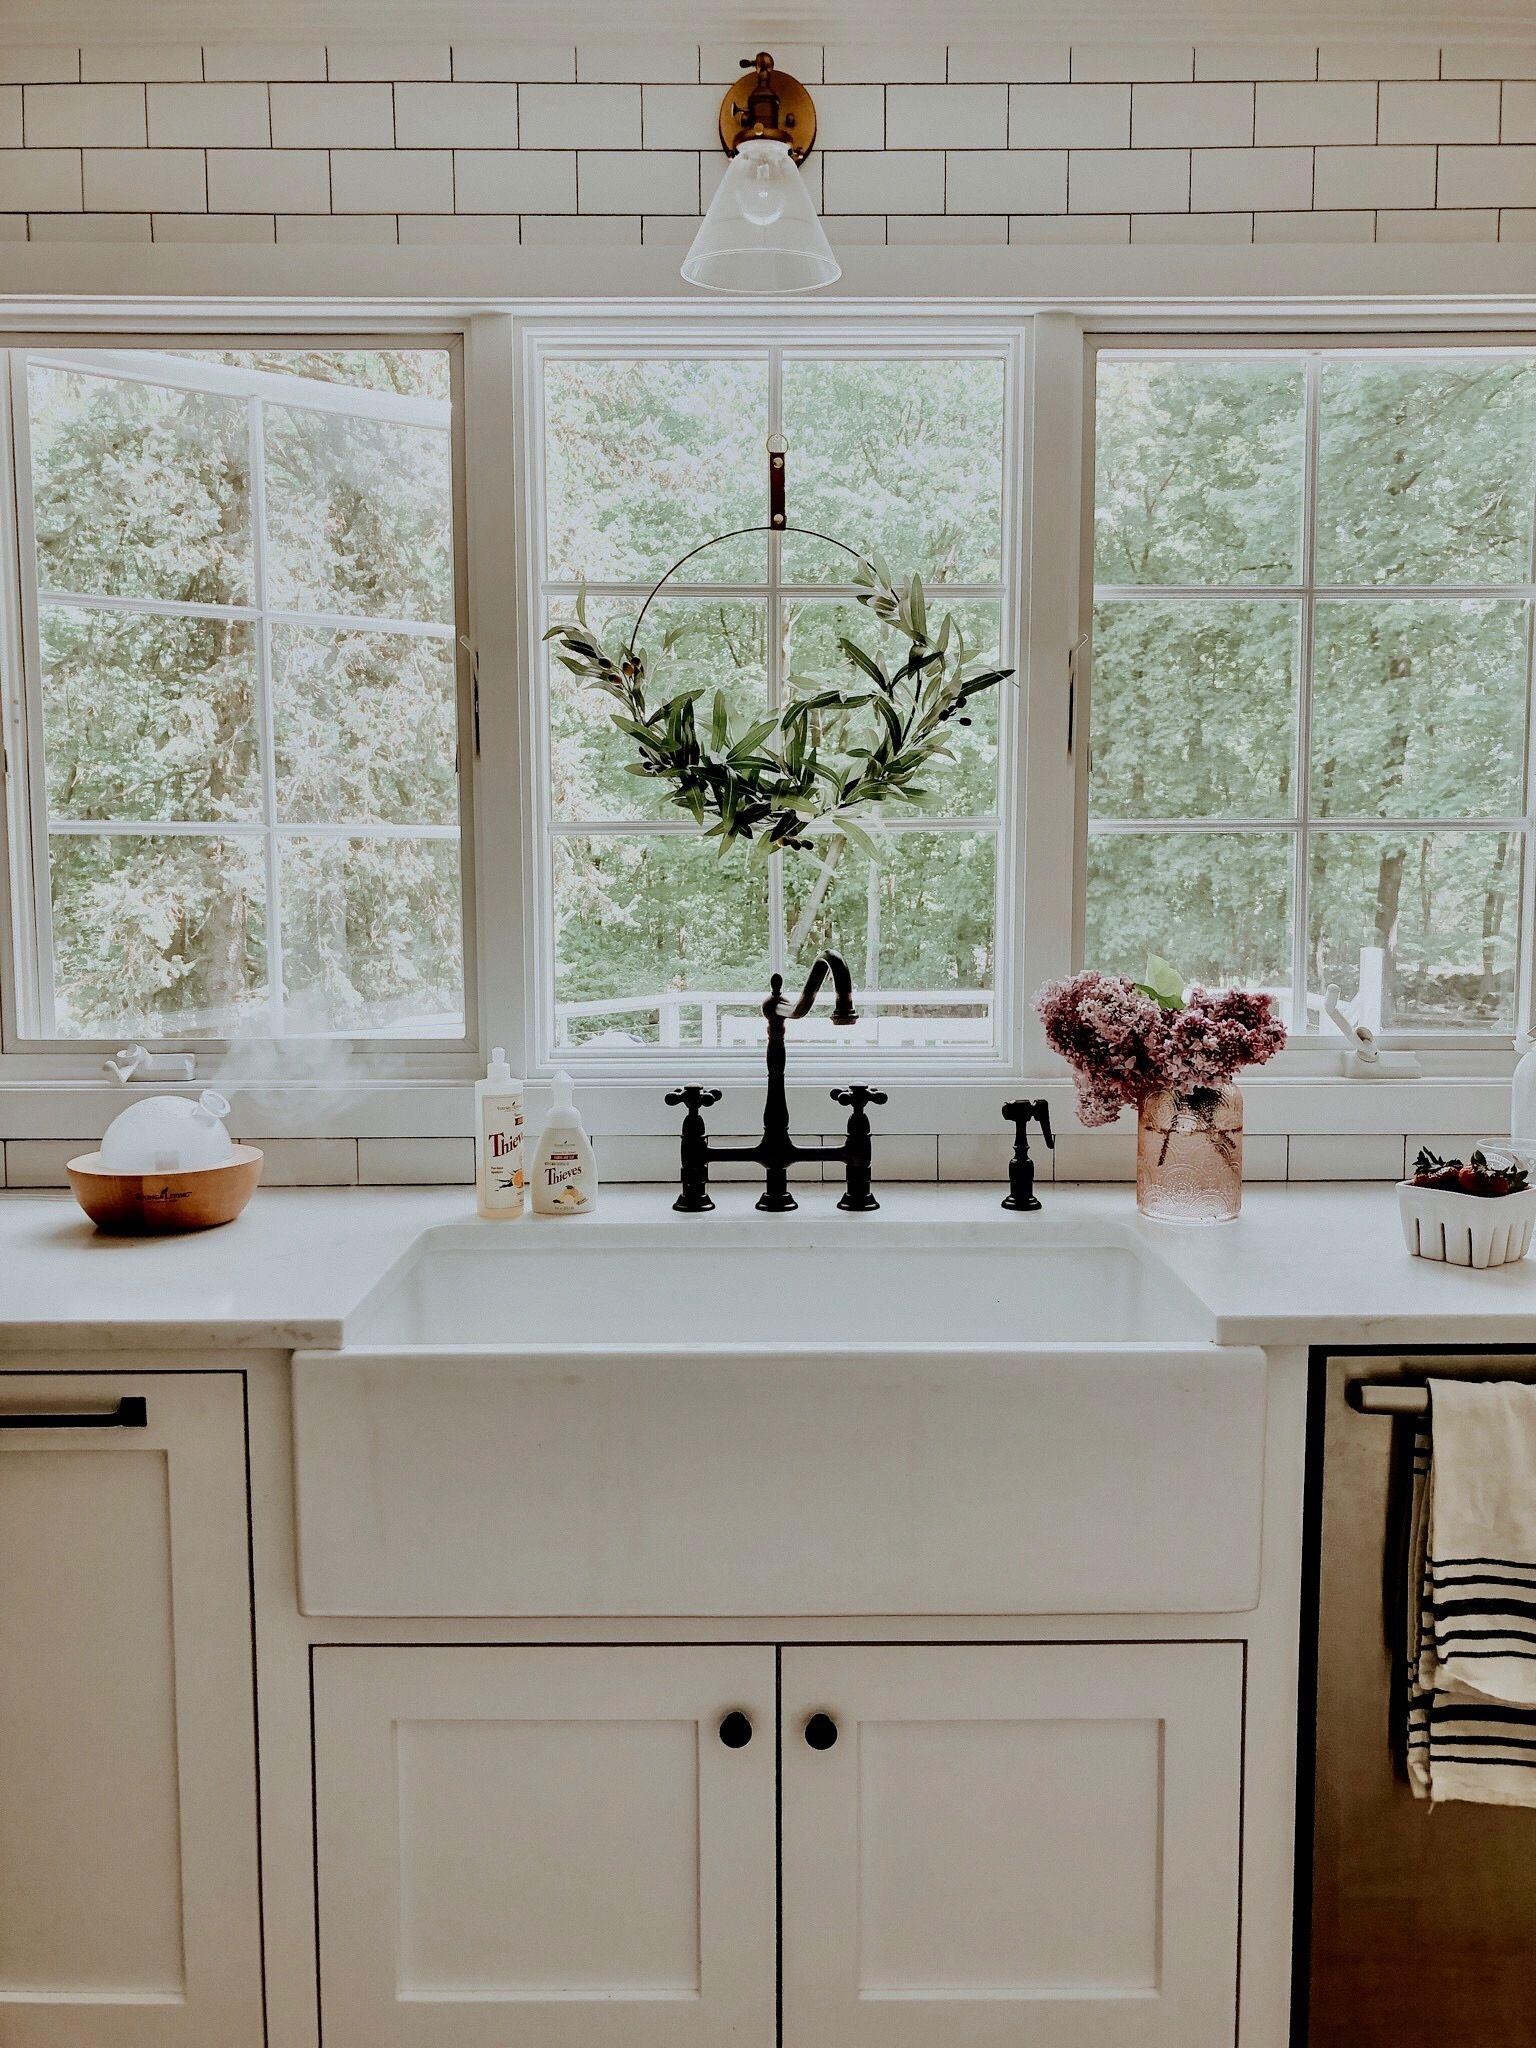 Modern farmhouse kitchen goals! ?: Pure Joy Home   Rustic ... on Farmhouse Kitchen Sink Ideas  id=34348